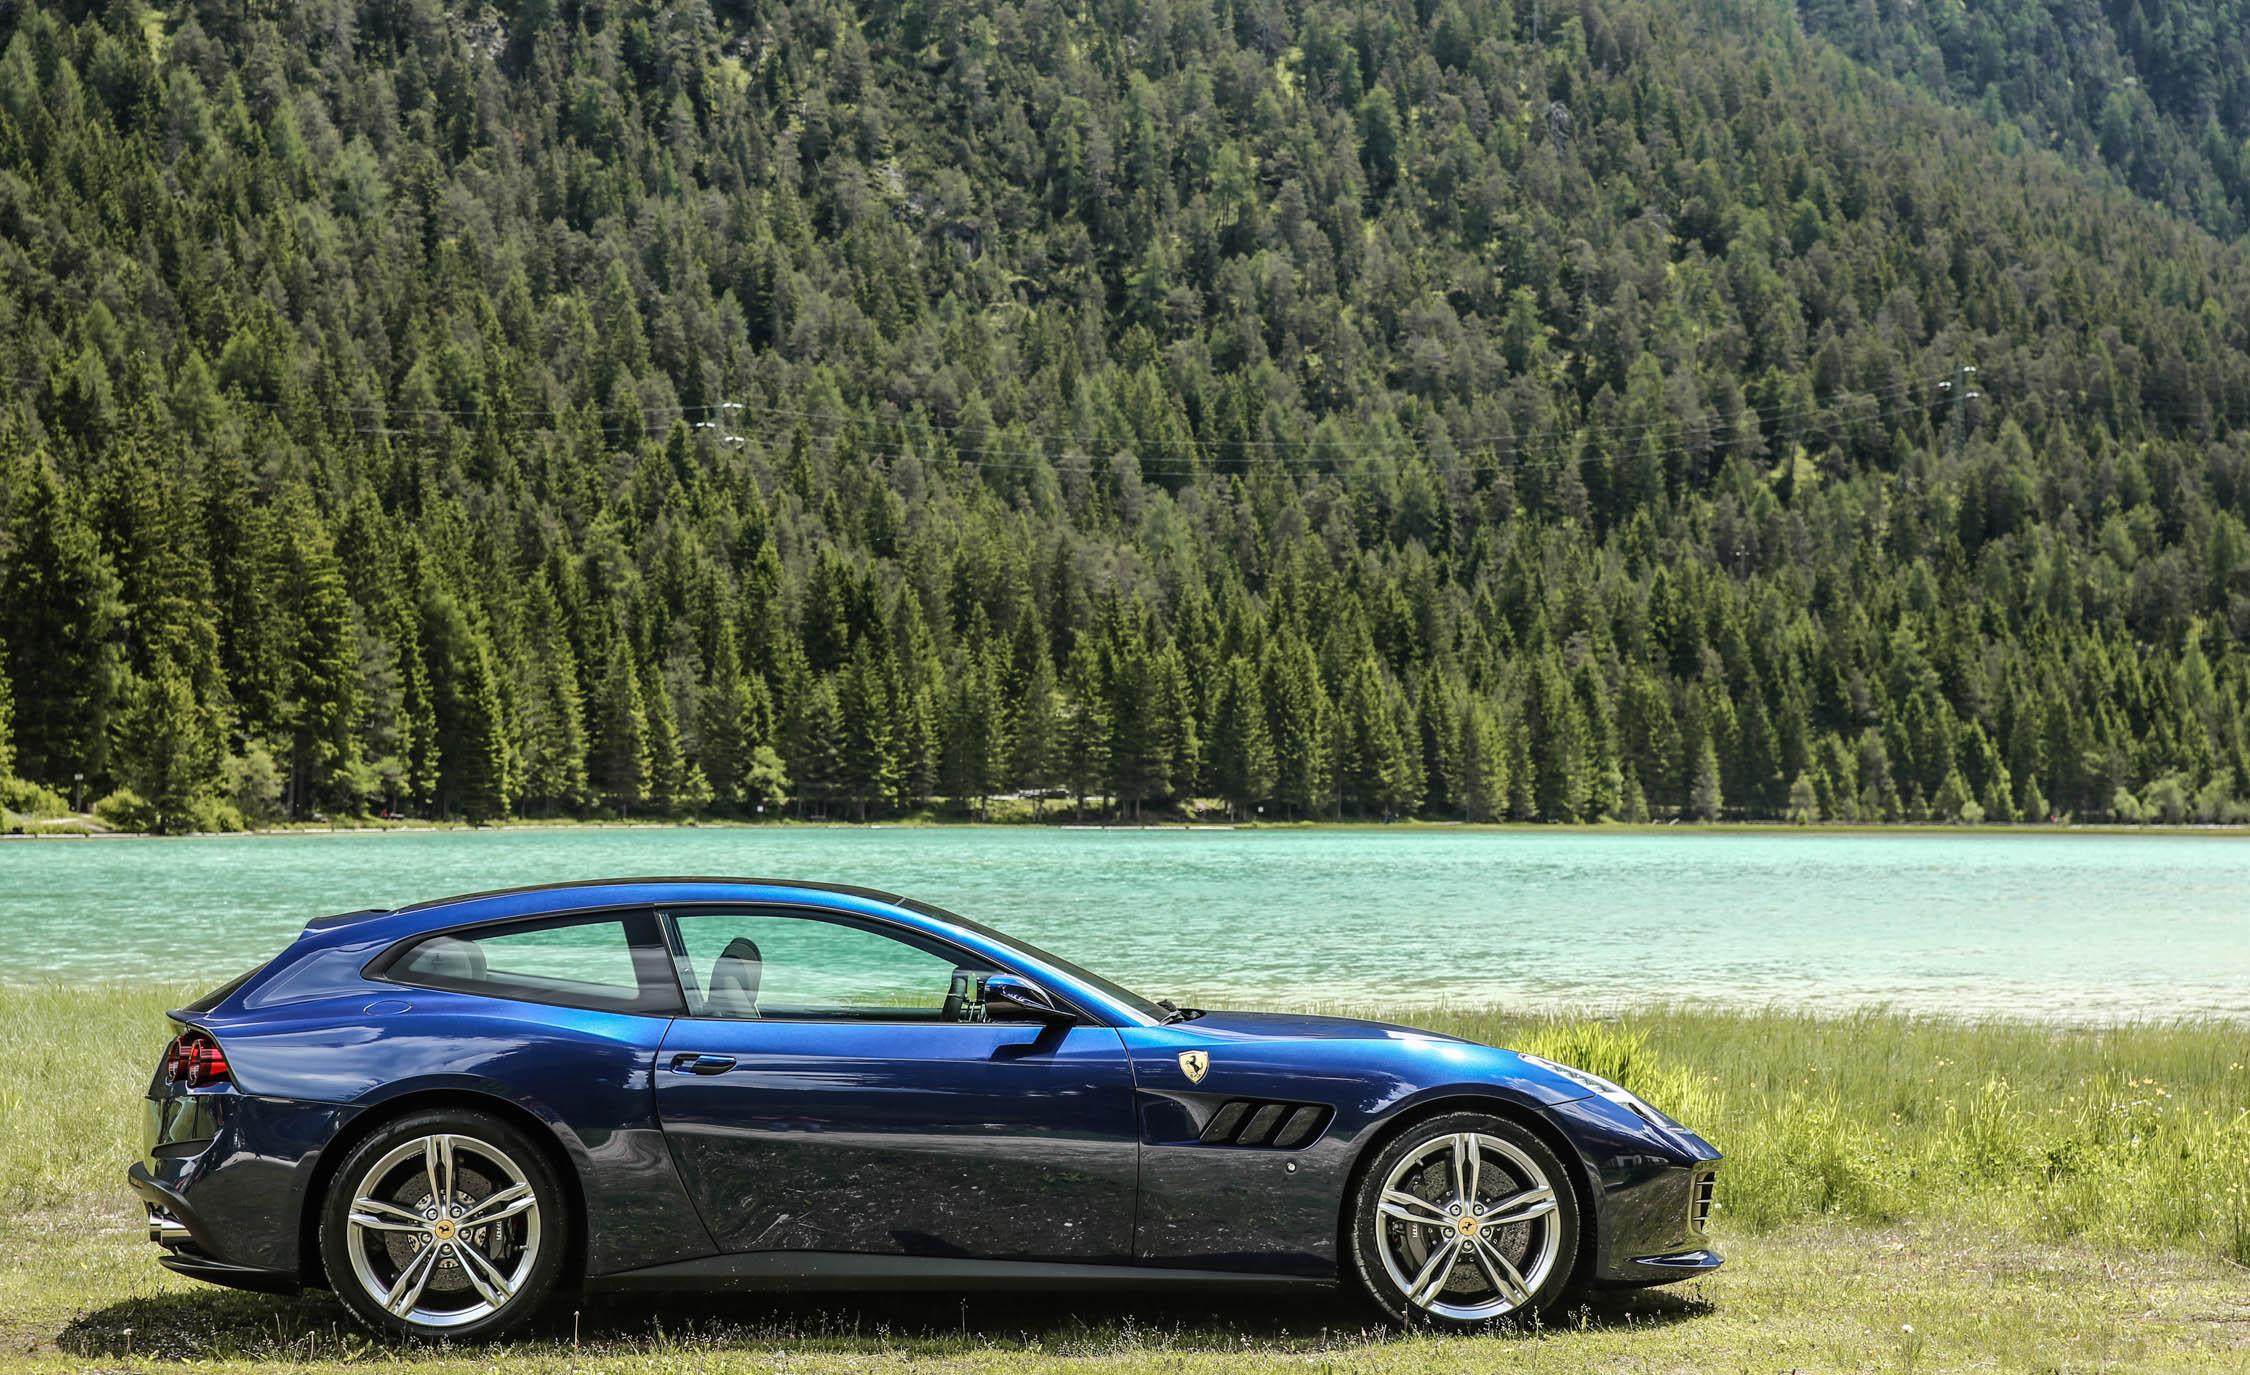 2017 Ferrari GTC4Lusso (View 44 of 52)